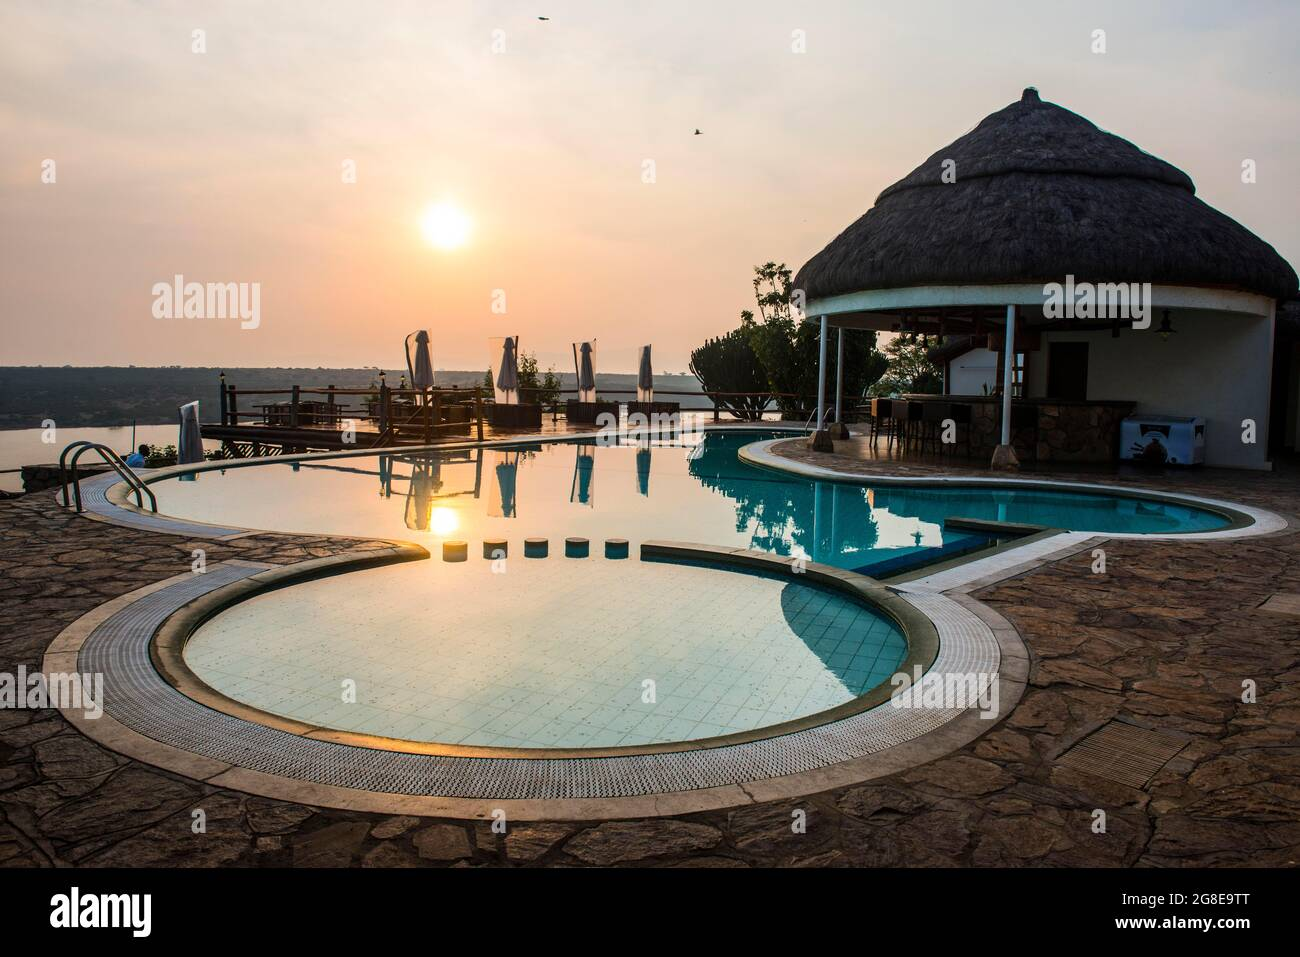 Swimming pool above the Kazinga channel linking lake george and lake Edward at sunset, Queen Elizabeth National Park, Uganda Stock Photo